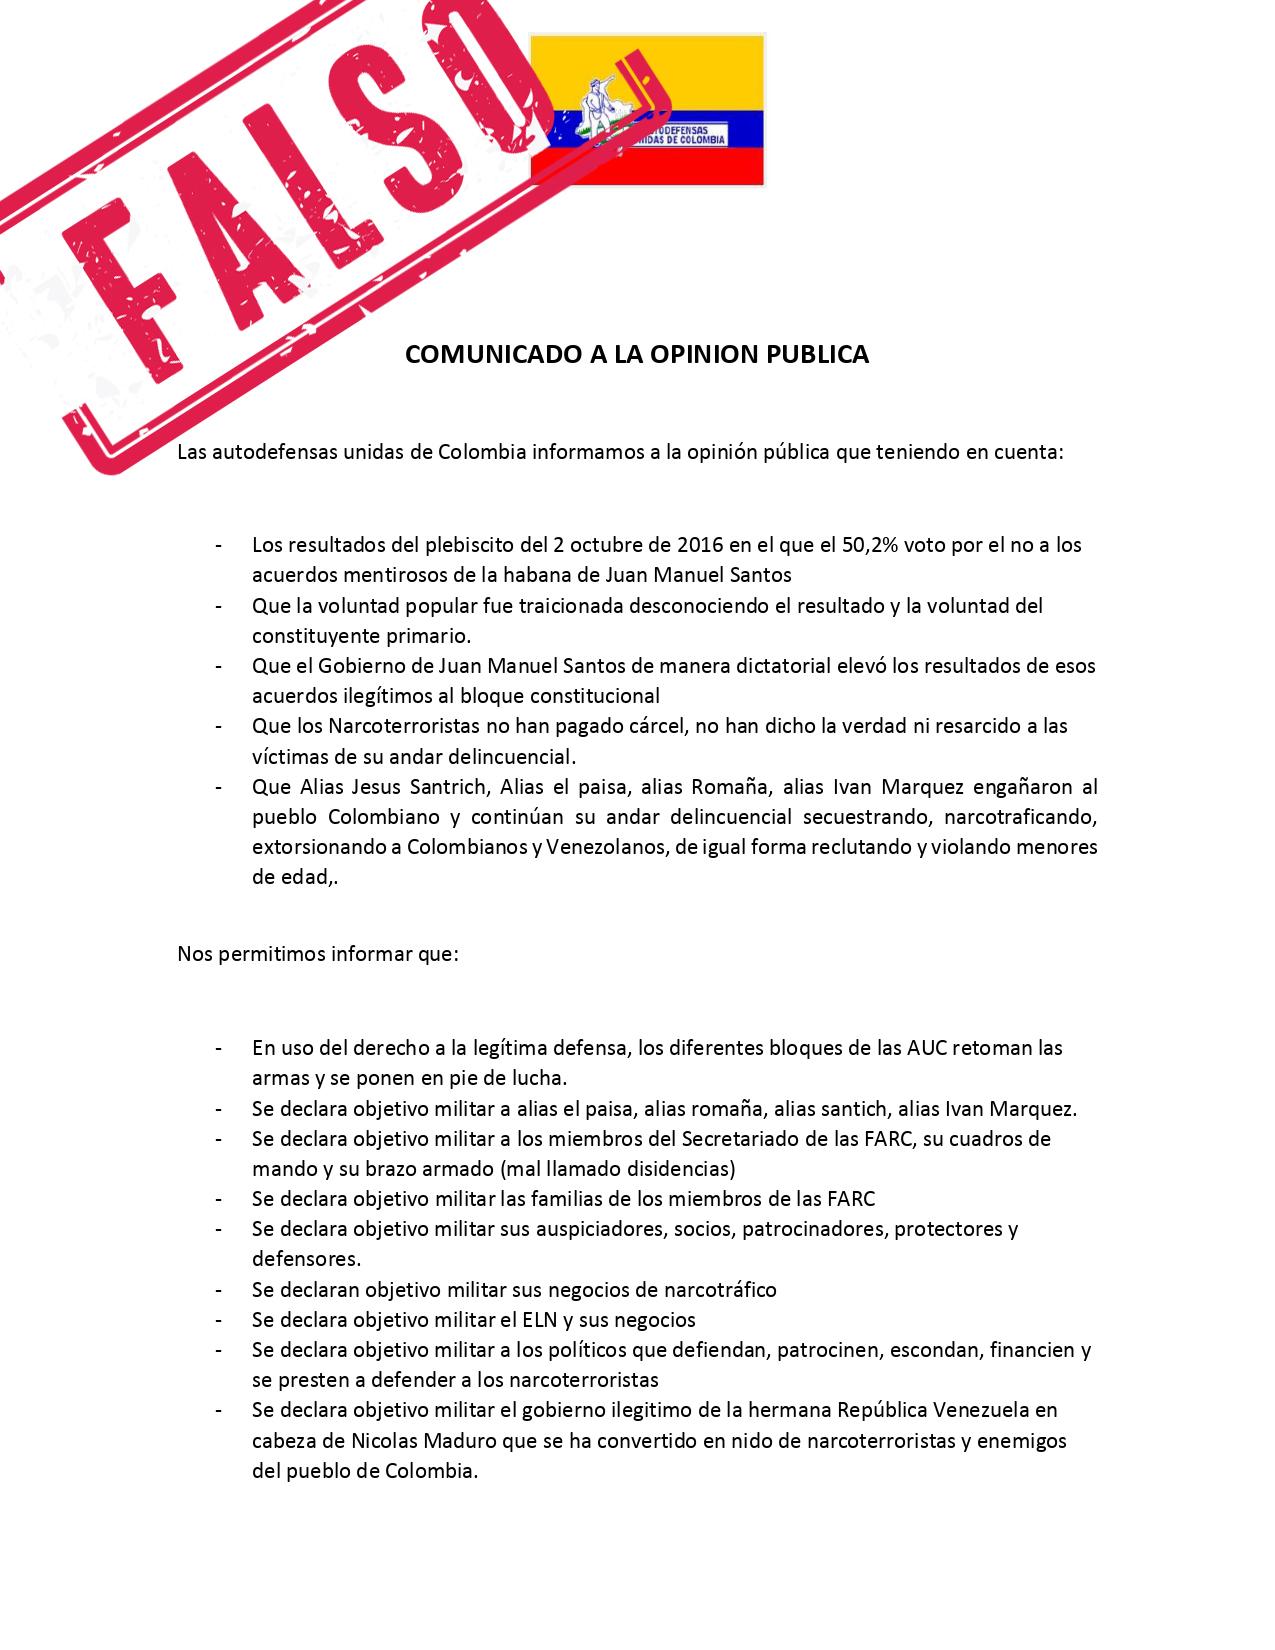 Comunicado falso 1